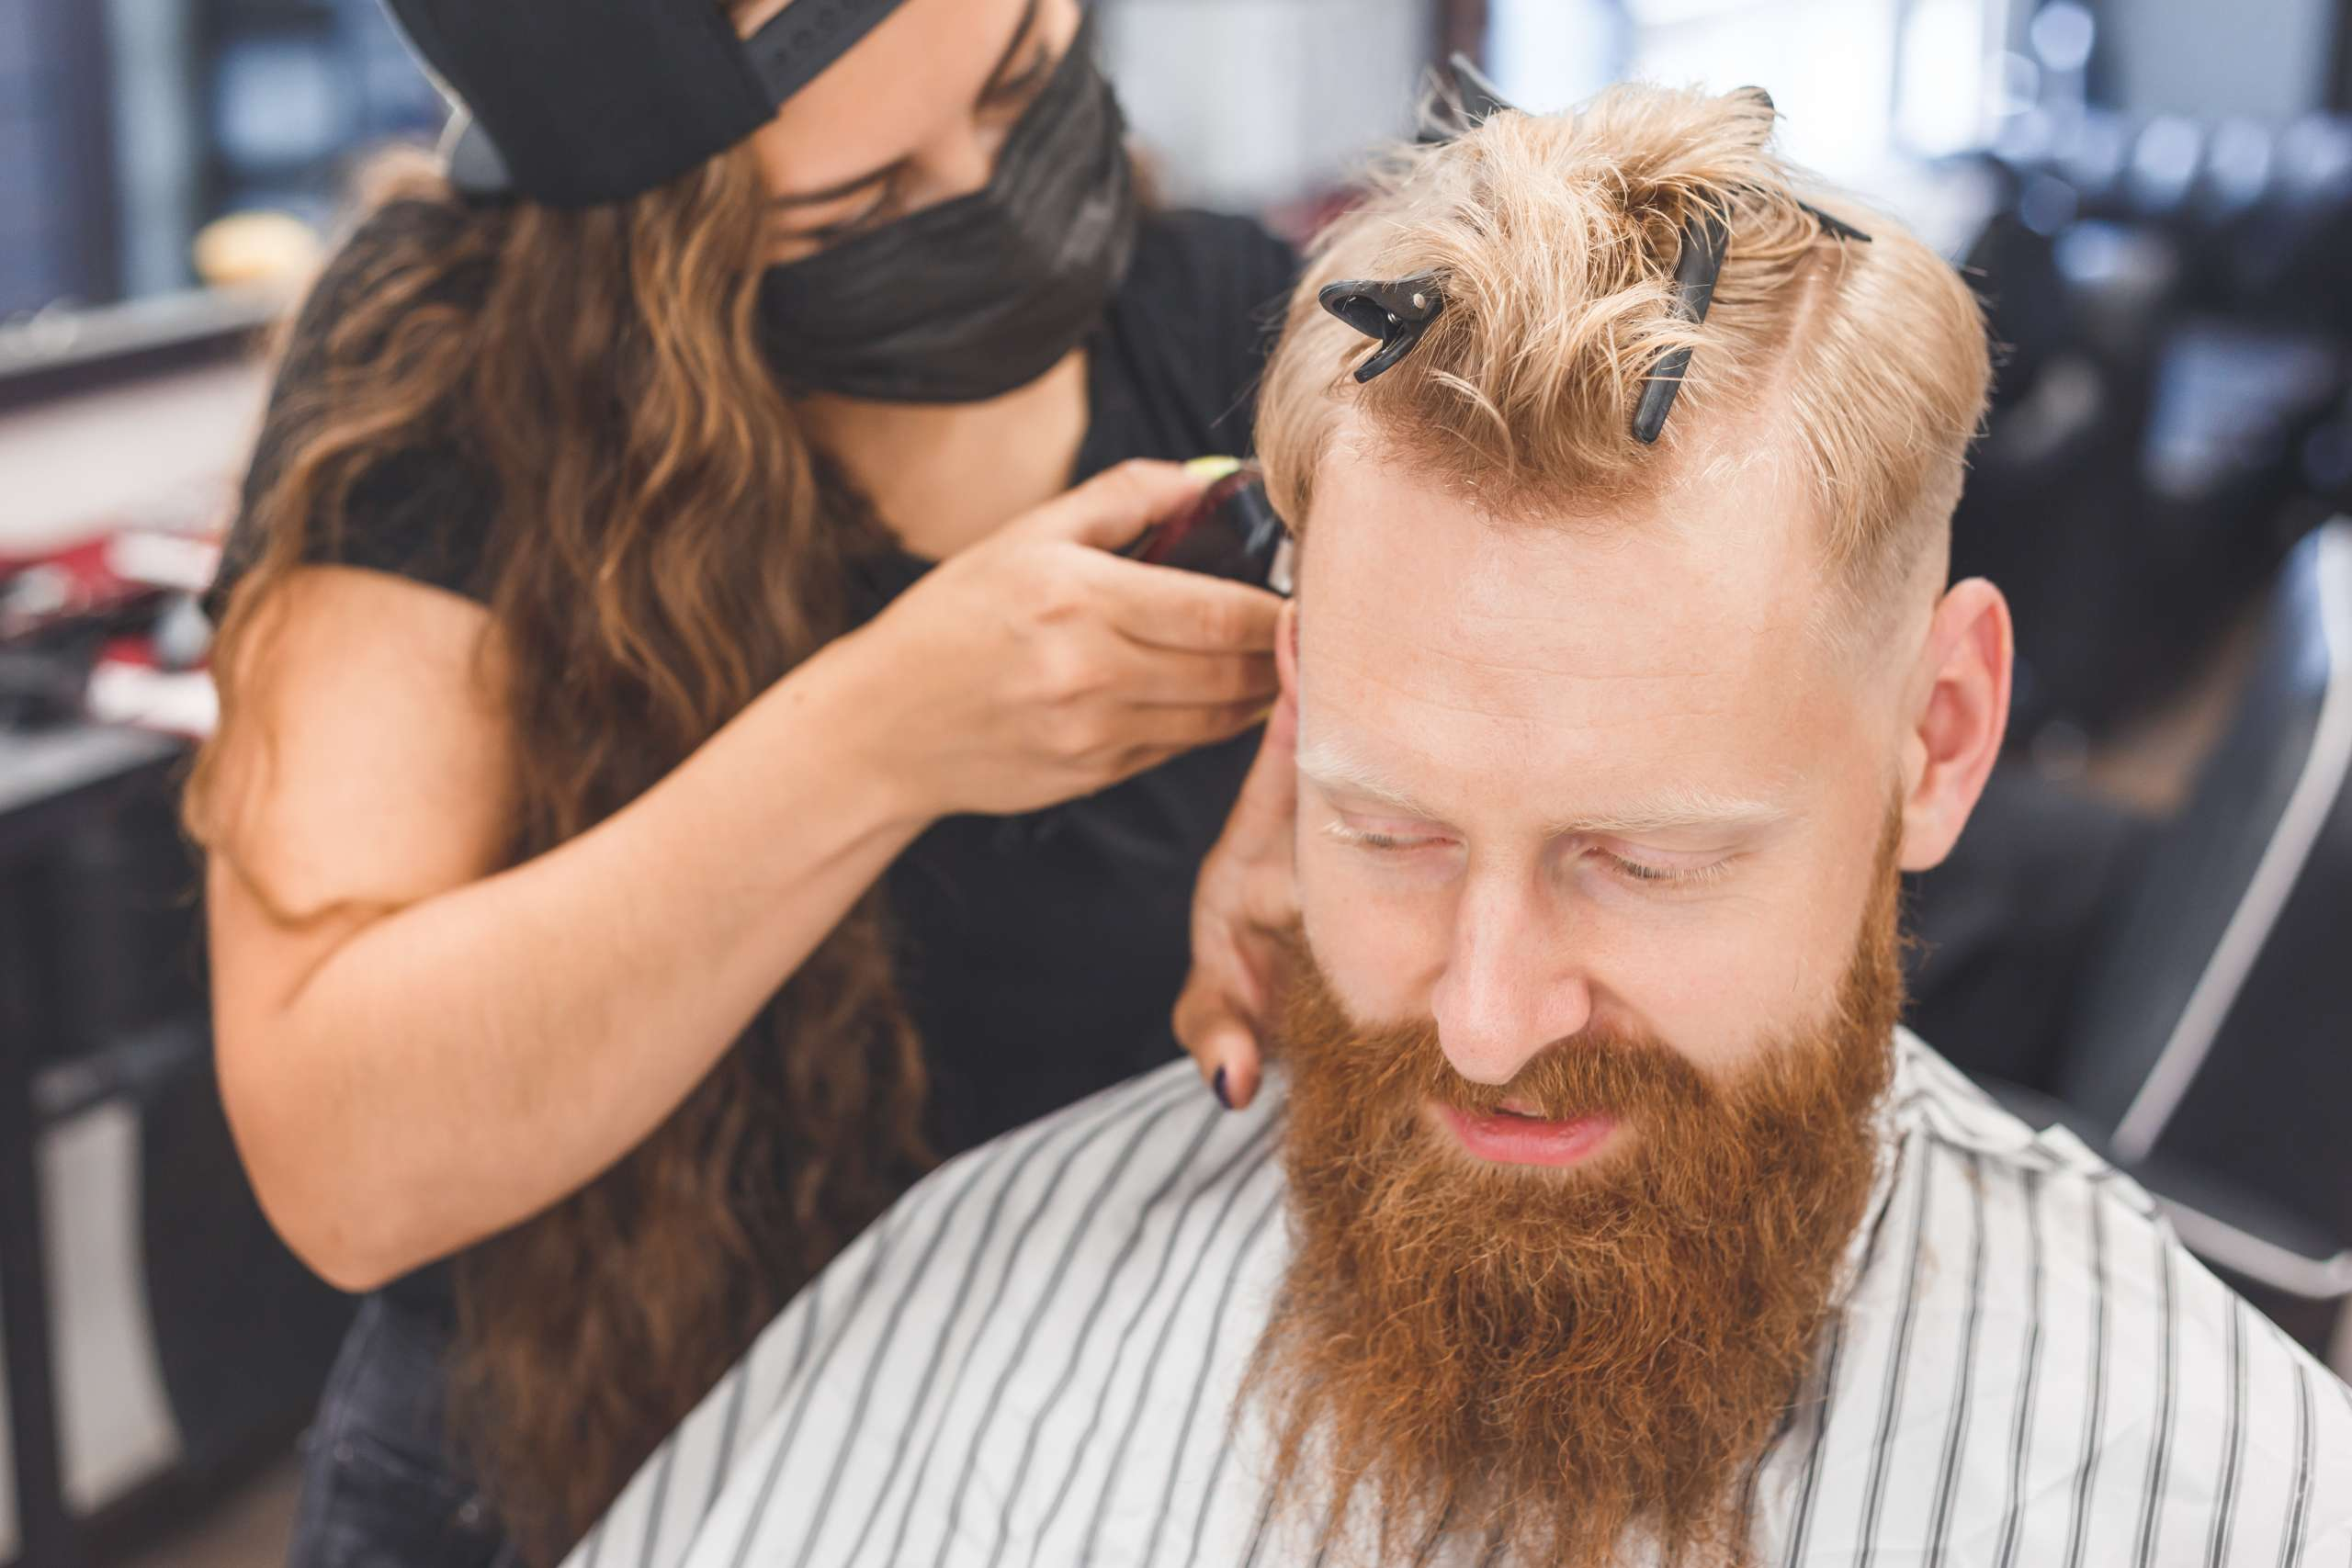 Men's haircut in a barbershop. Hair care. Barber in mask protecting from virus. Haircut in quarantine.